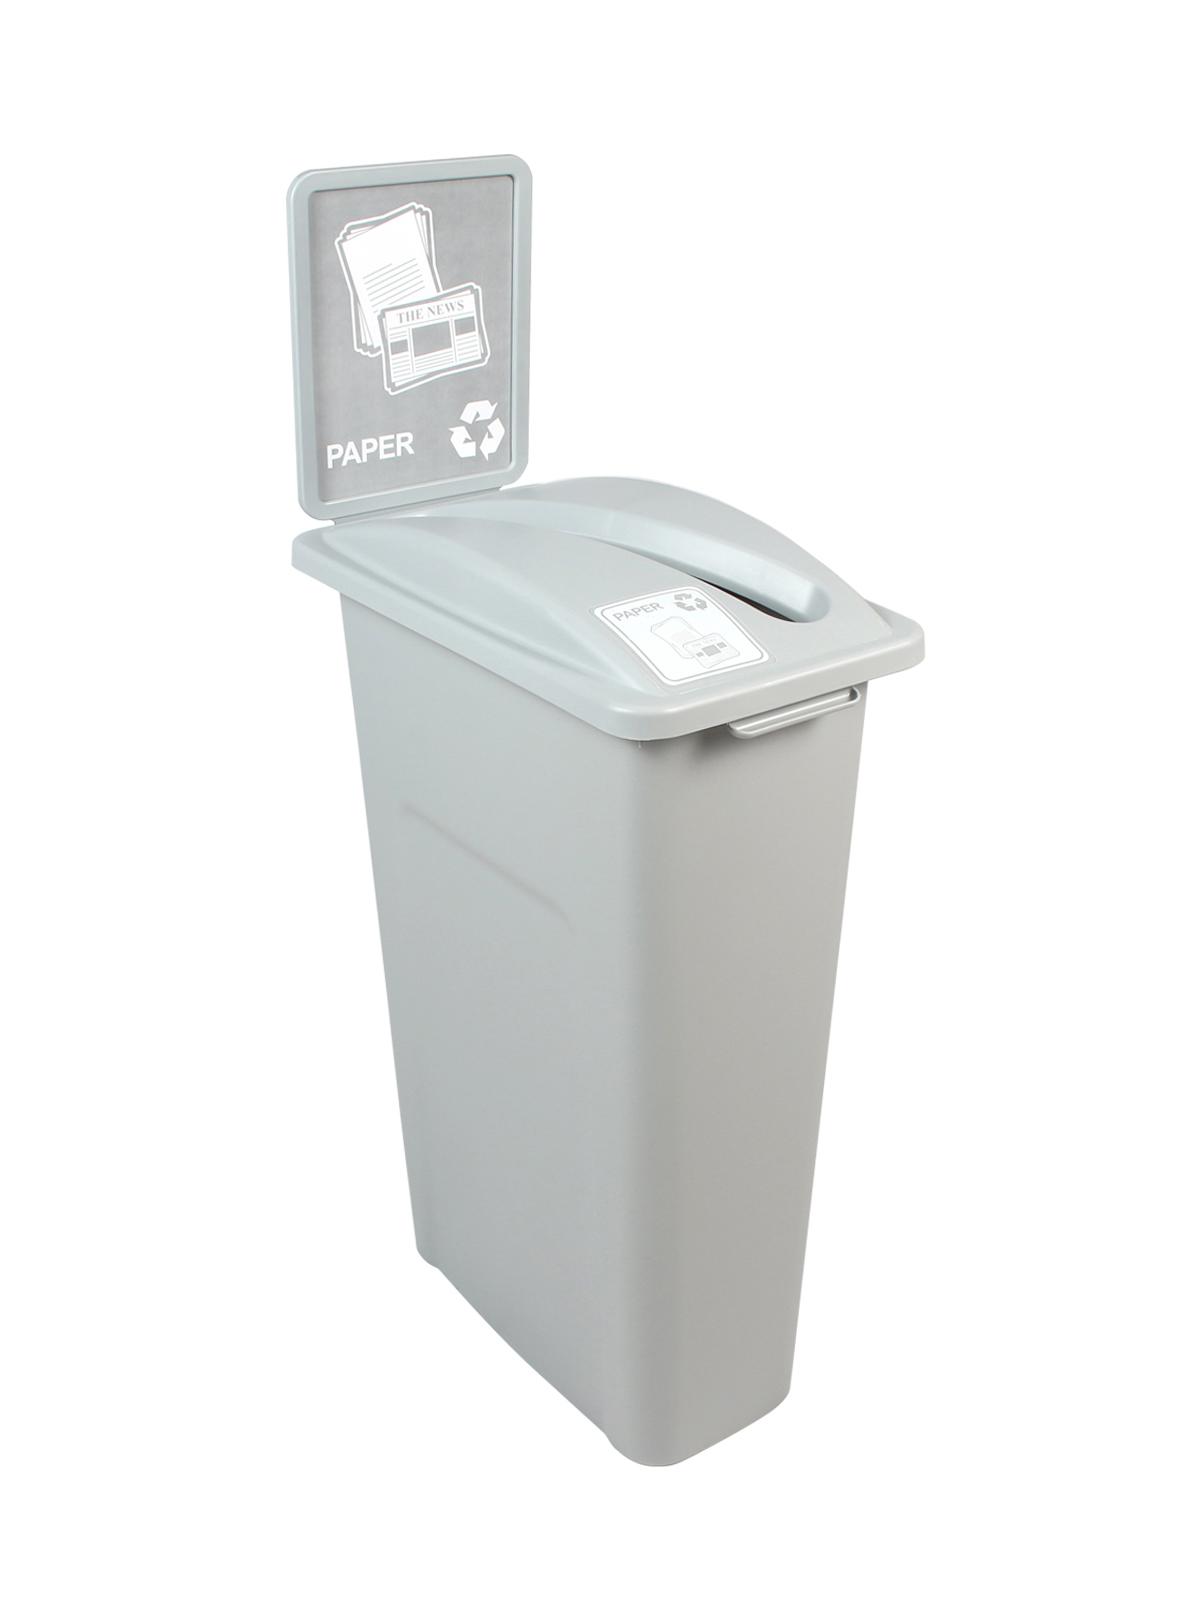 WASTE WATCHER - Single - Paper - Slot - Grey